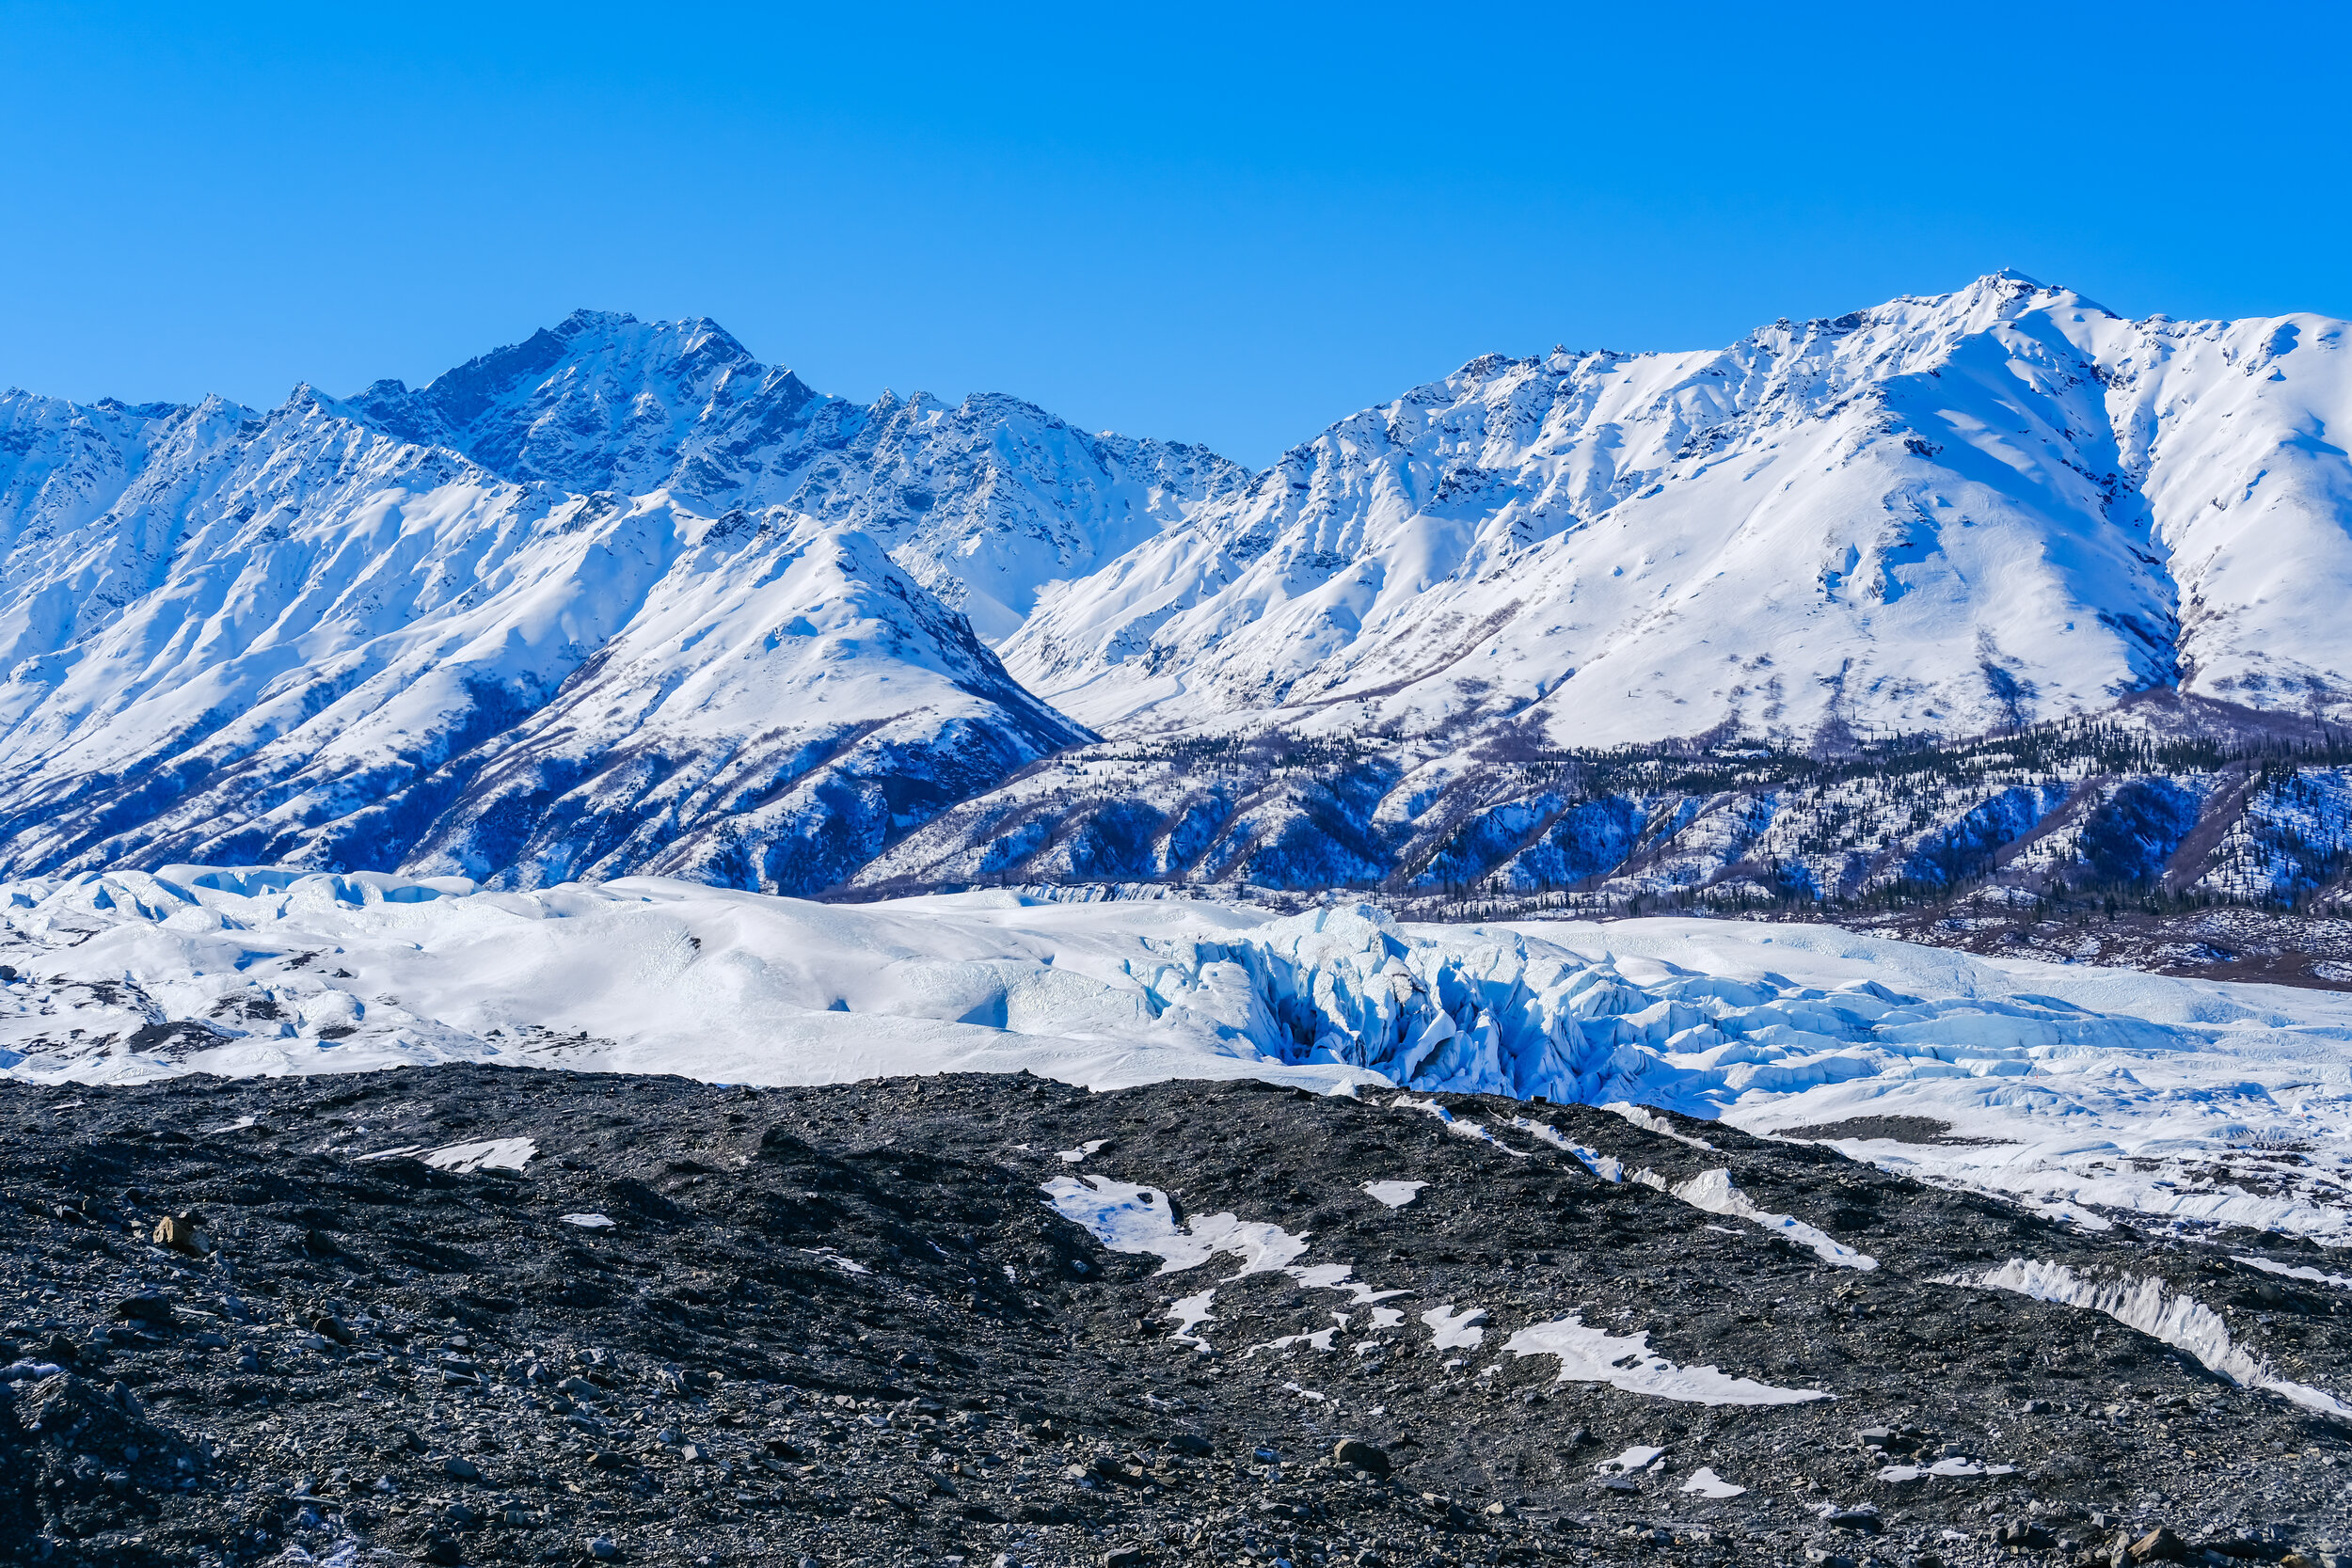 Engagement_Session_Matanuska_Glacier_Alaska_Emily_Lester_Photography-708.jpg